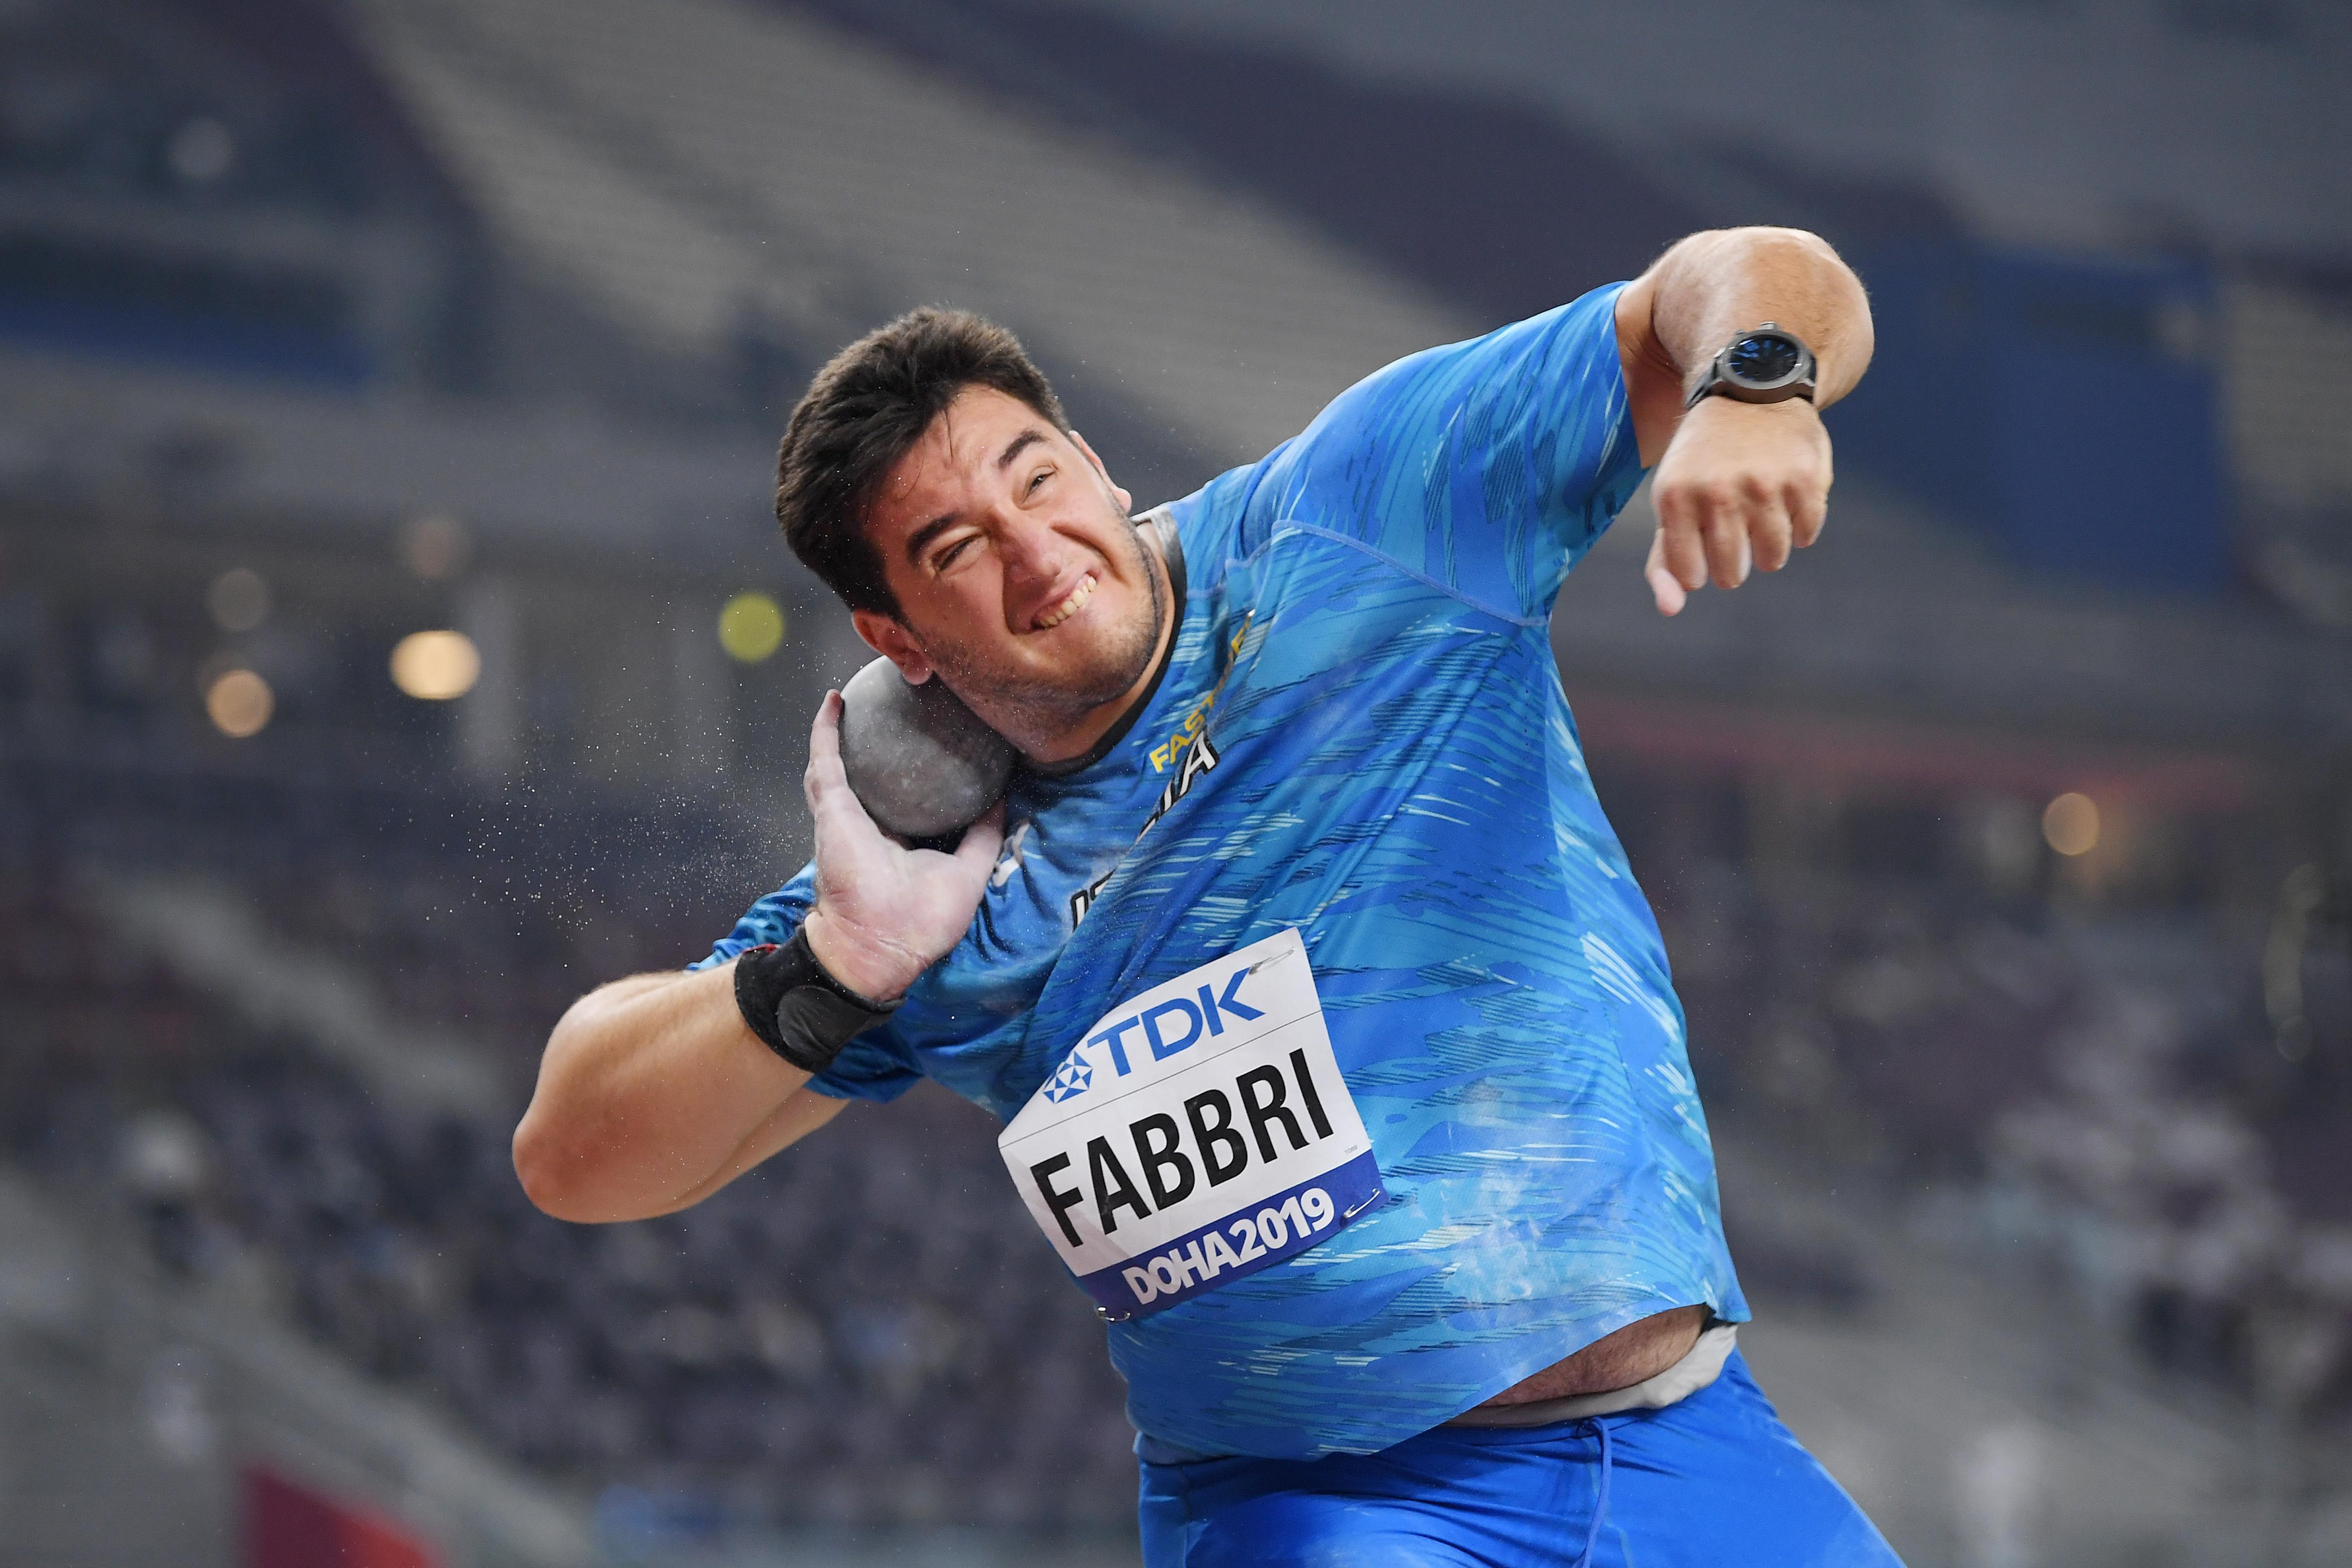 Leonardo Fabbri in the shot put at the World Athletics Championships Doha 2019 (Getty Images)